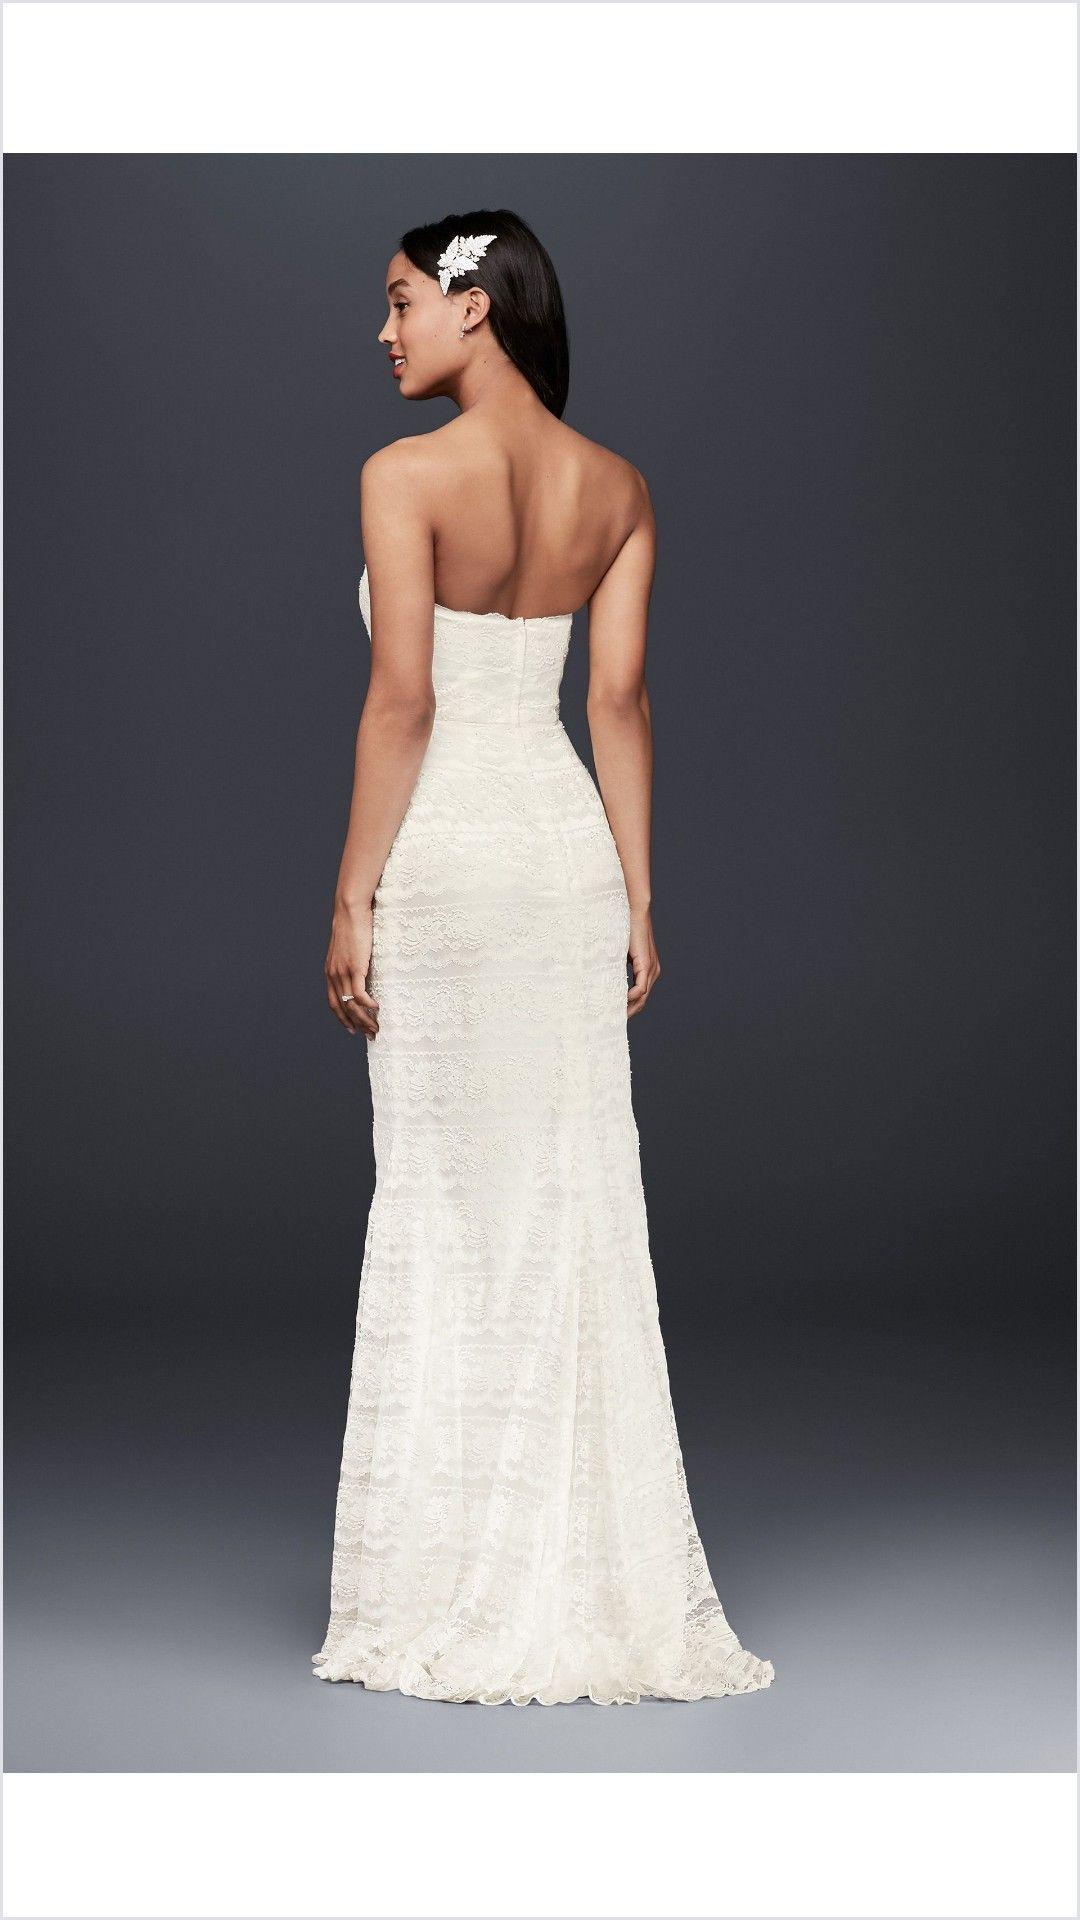 Idea by Denyeal on Weathington Wedding Sheath wedding